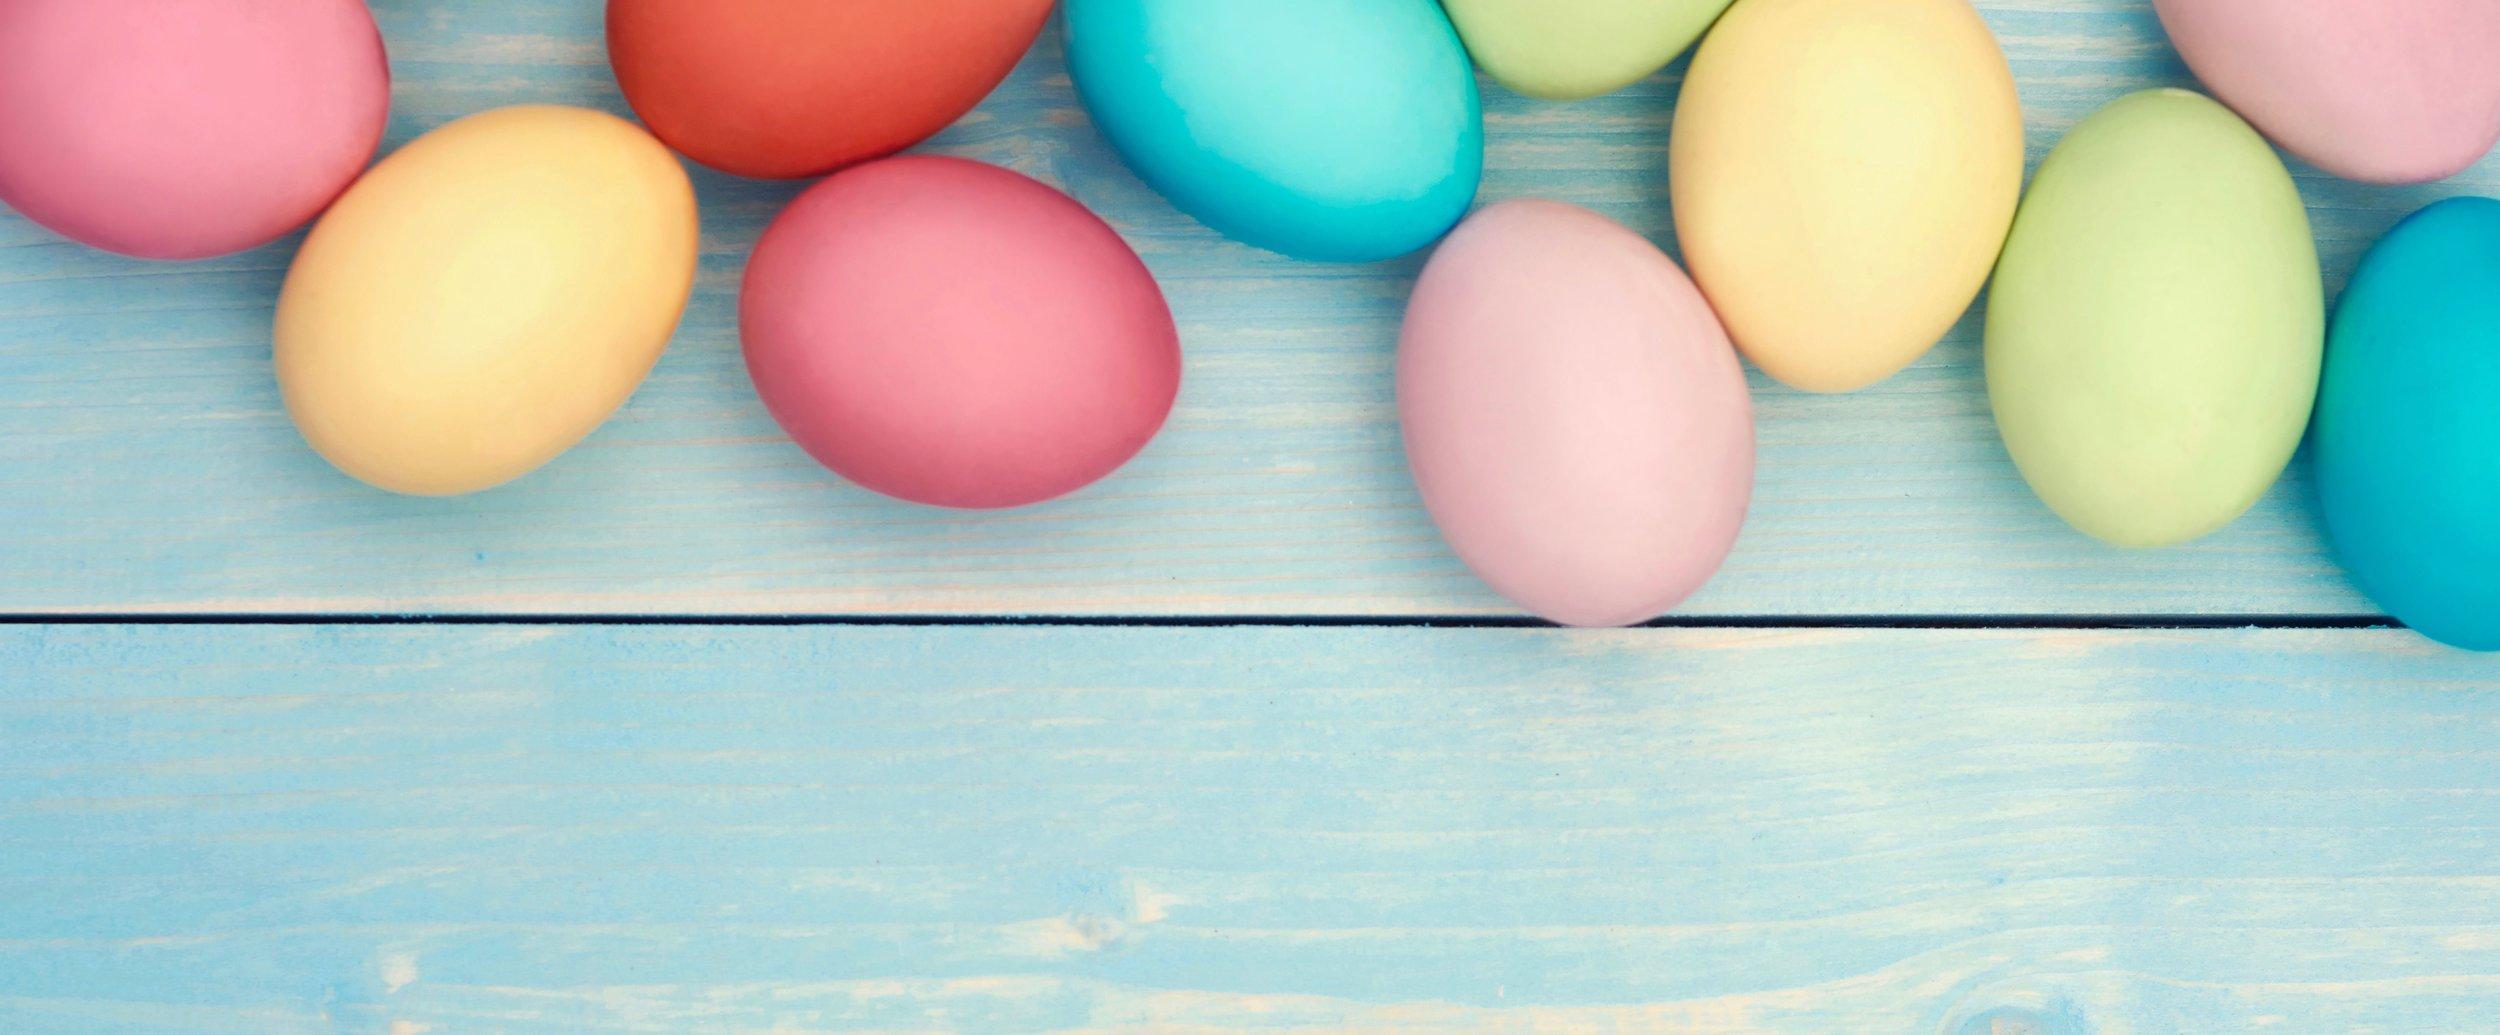 Internet-Easter-Eggs-compressor.jpg